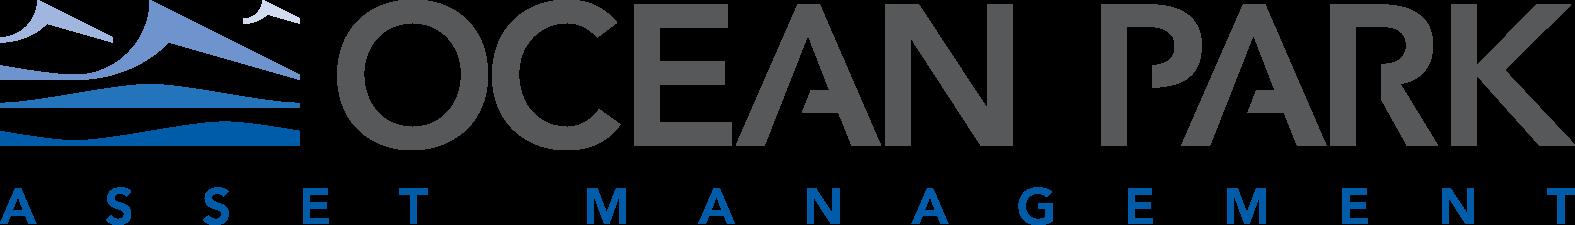 Ocean park Asset Management